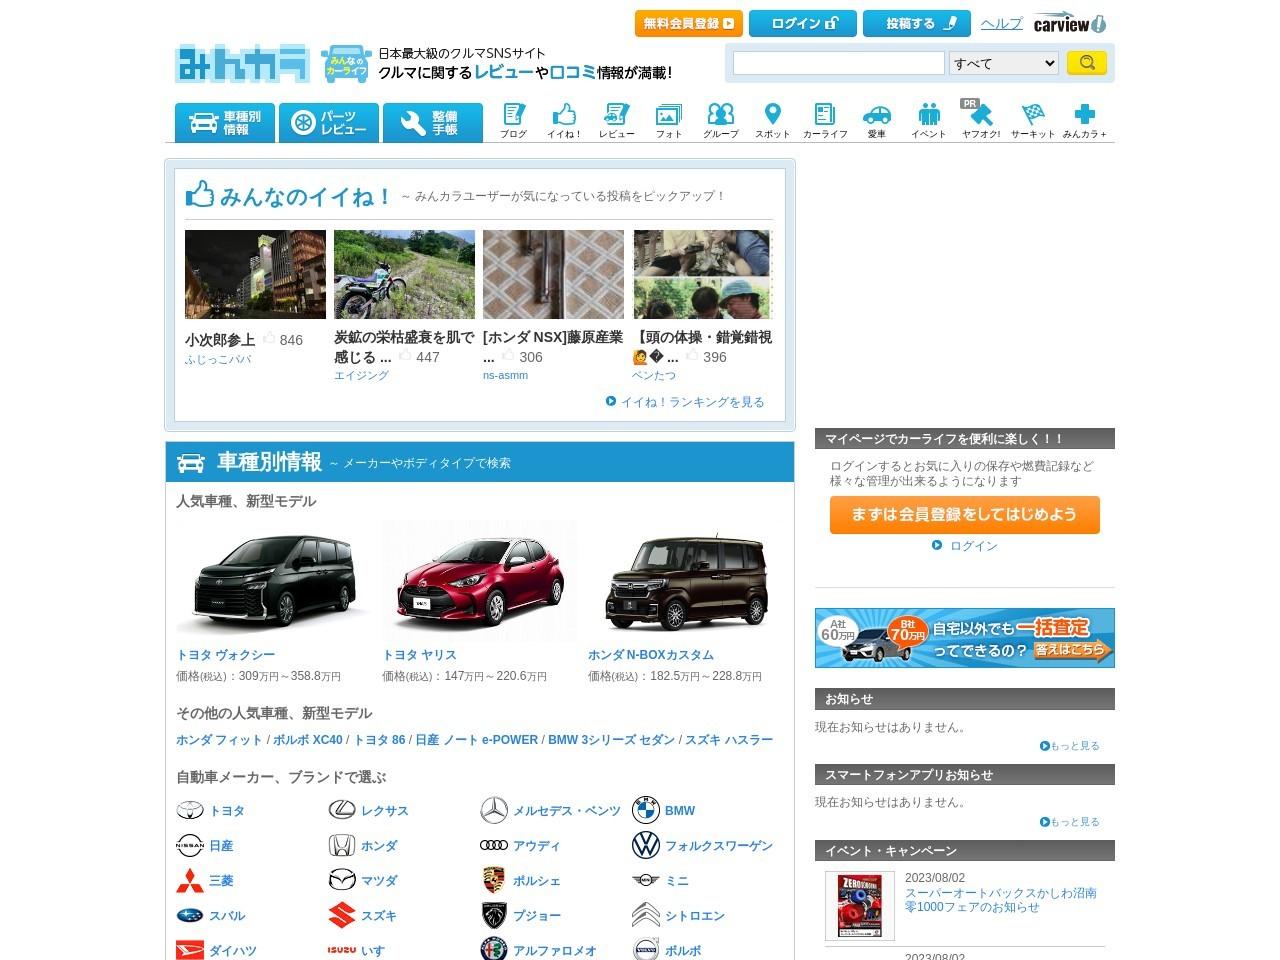 http://minkara.carview.co.jp/userid/1694223/blog/28538765/